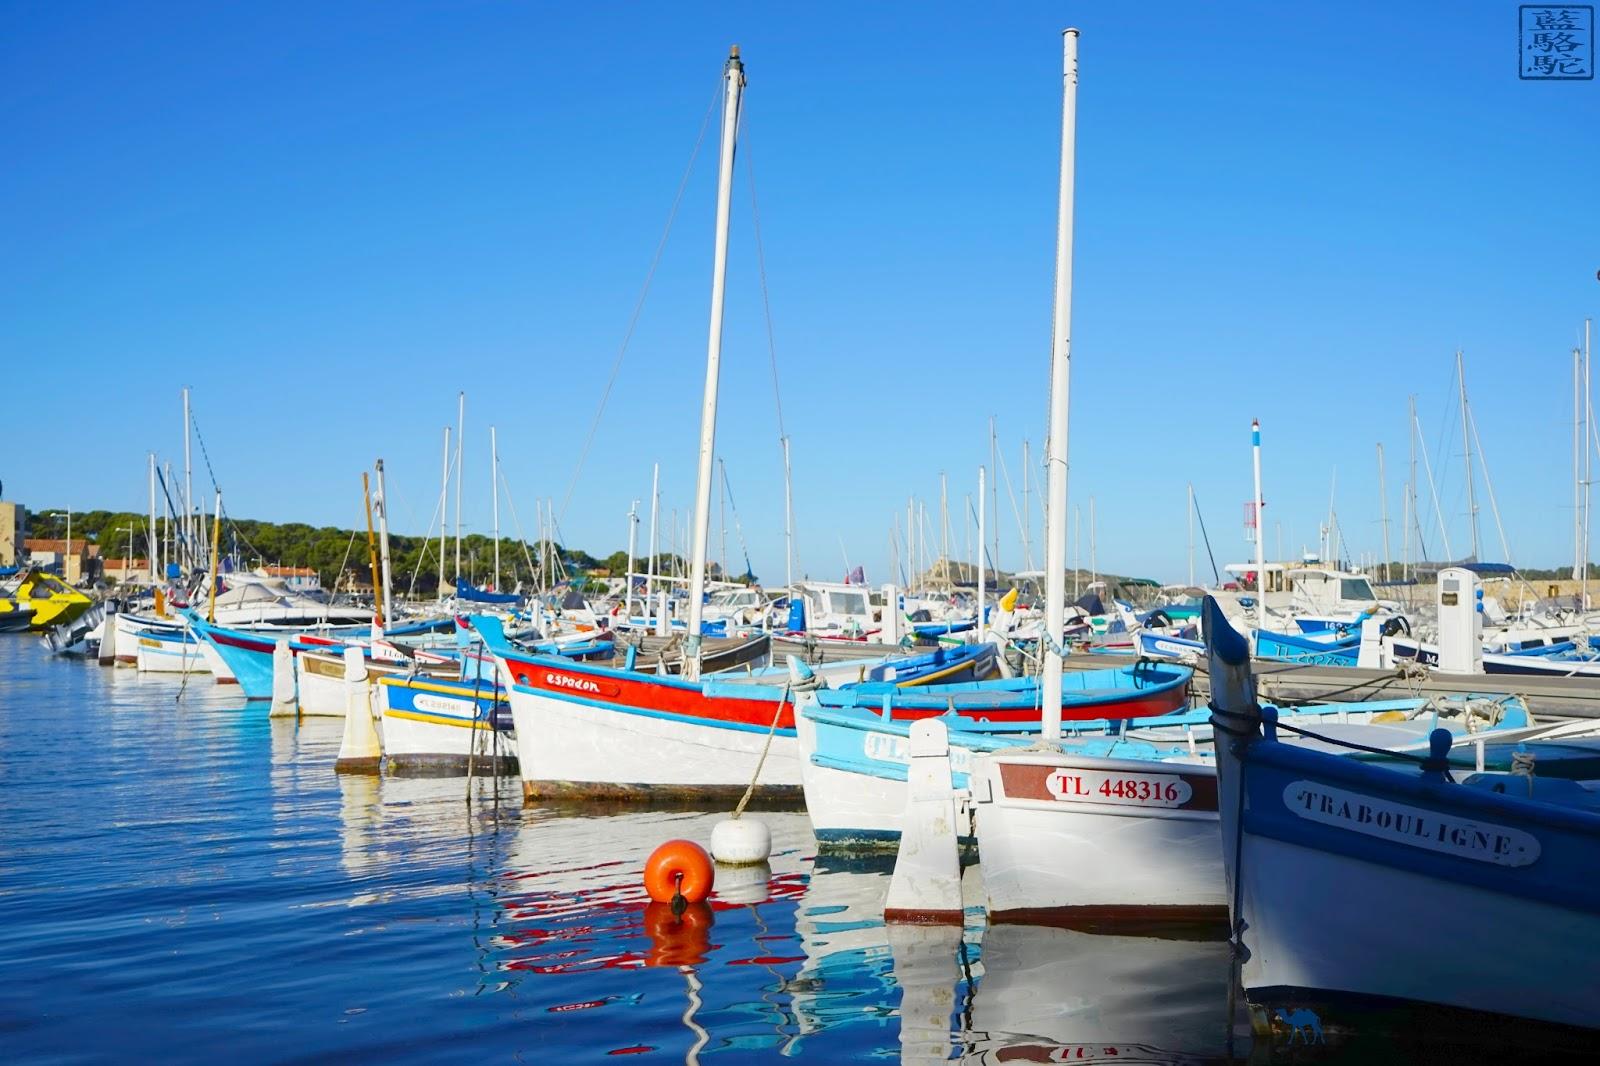 Le Chameau Bleu - Var - Port du Brusc